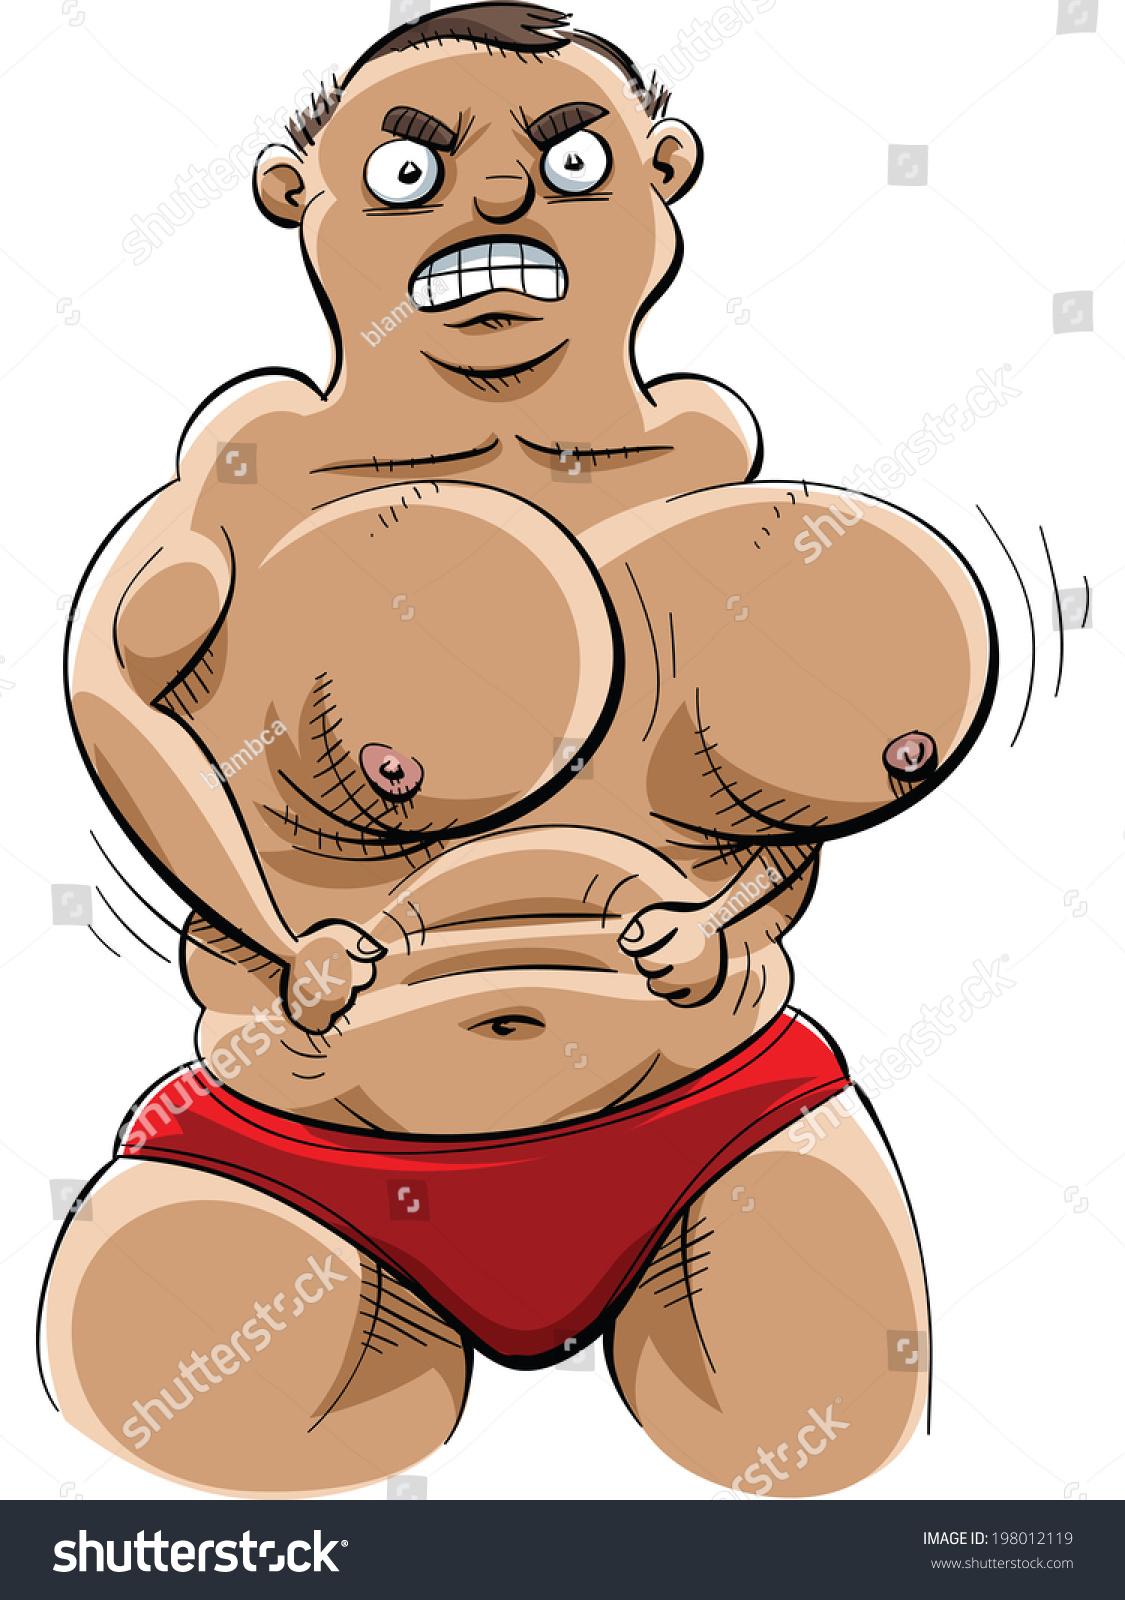 Cartoon Muscle Man Extreme Pecs Weak Stock Vector 198012119 ...